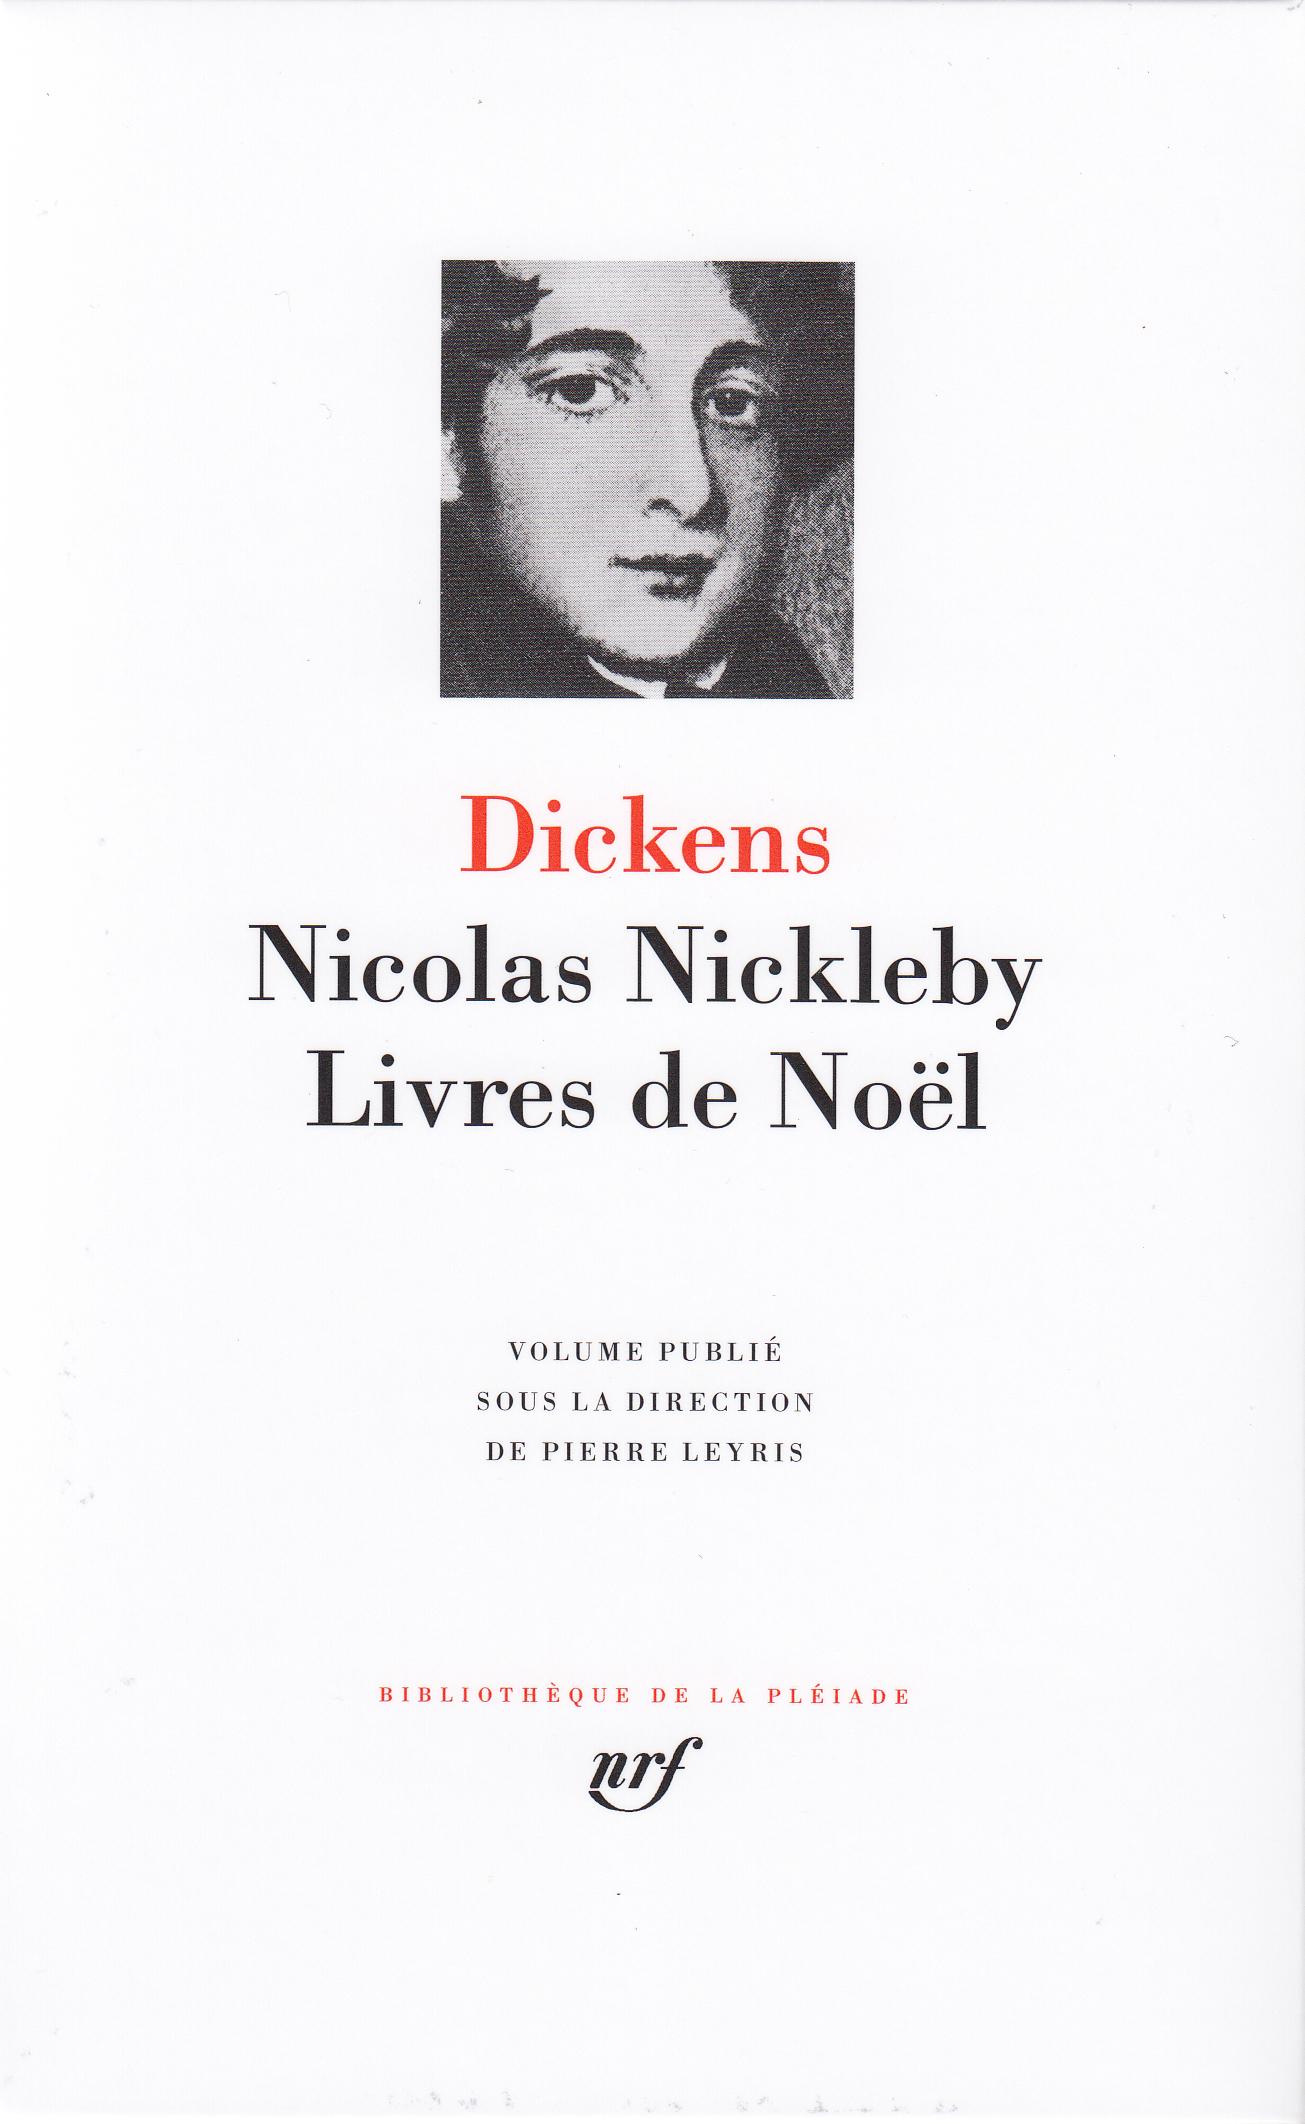 NICOLAS NICKLEBY / LIVRES DE NOEL